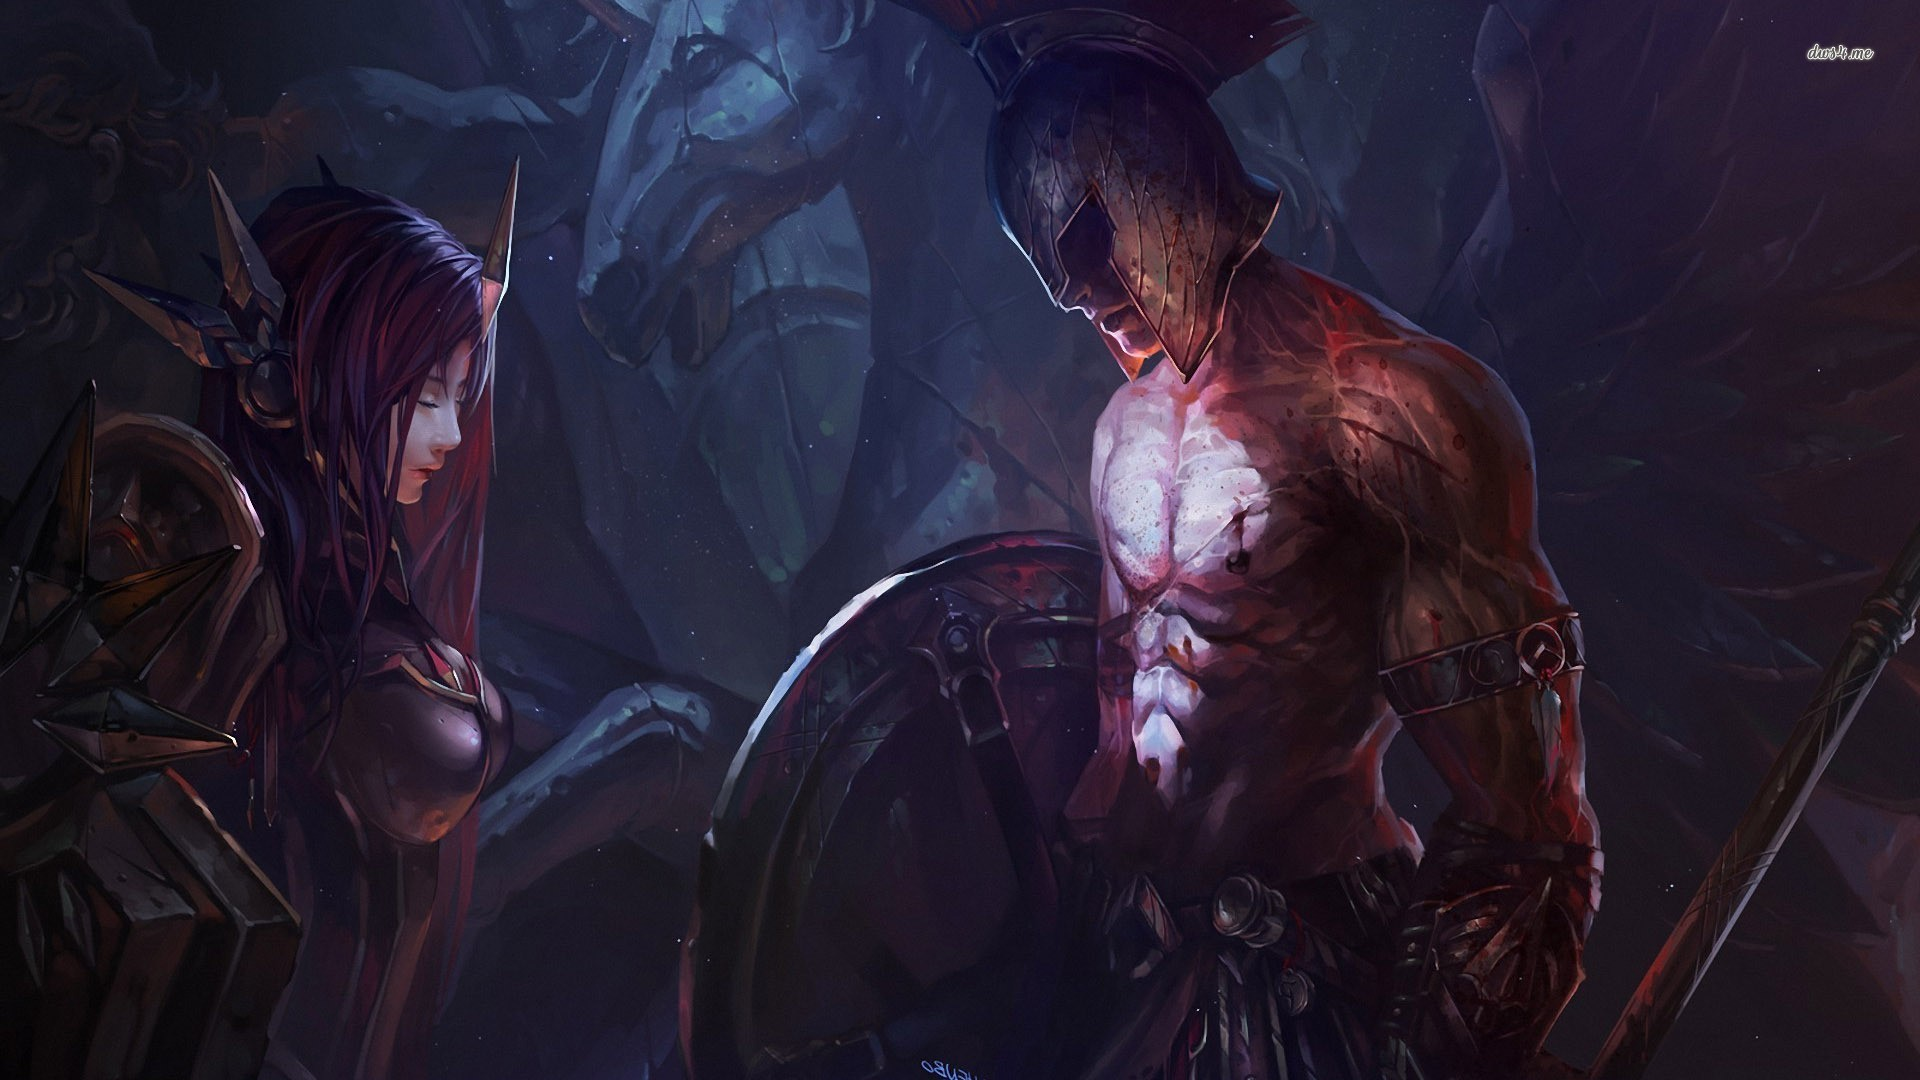 League Of Legends, Leona, Pantheon (League Of Legends) Wallpapers .